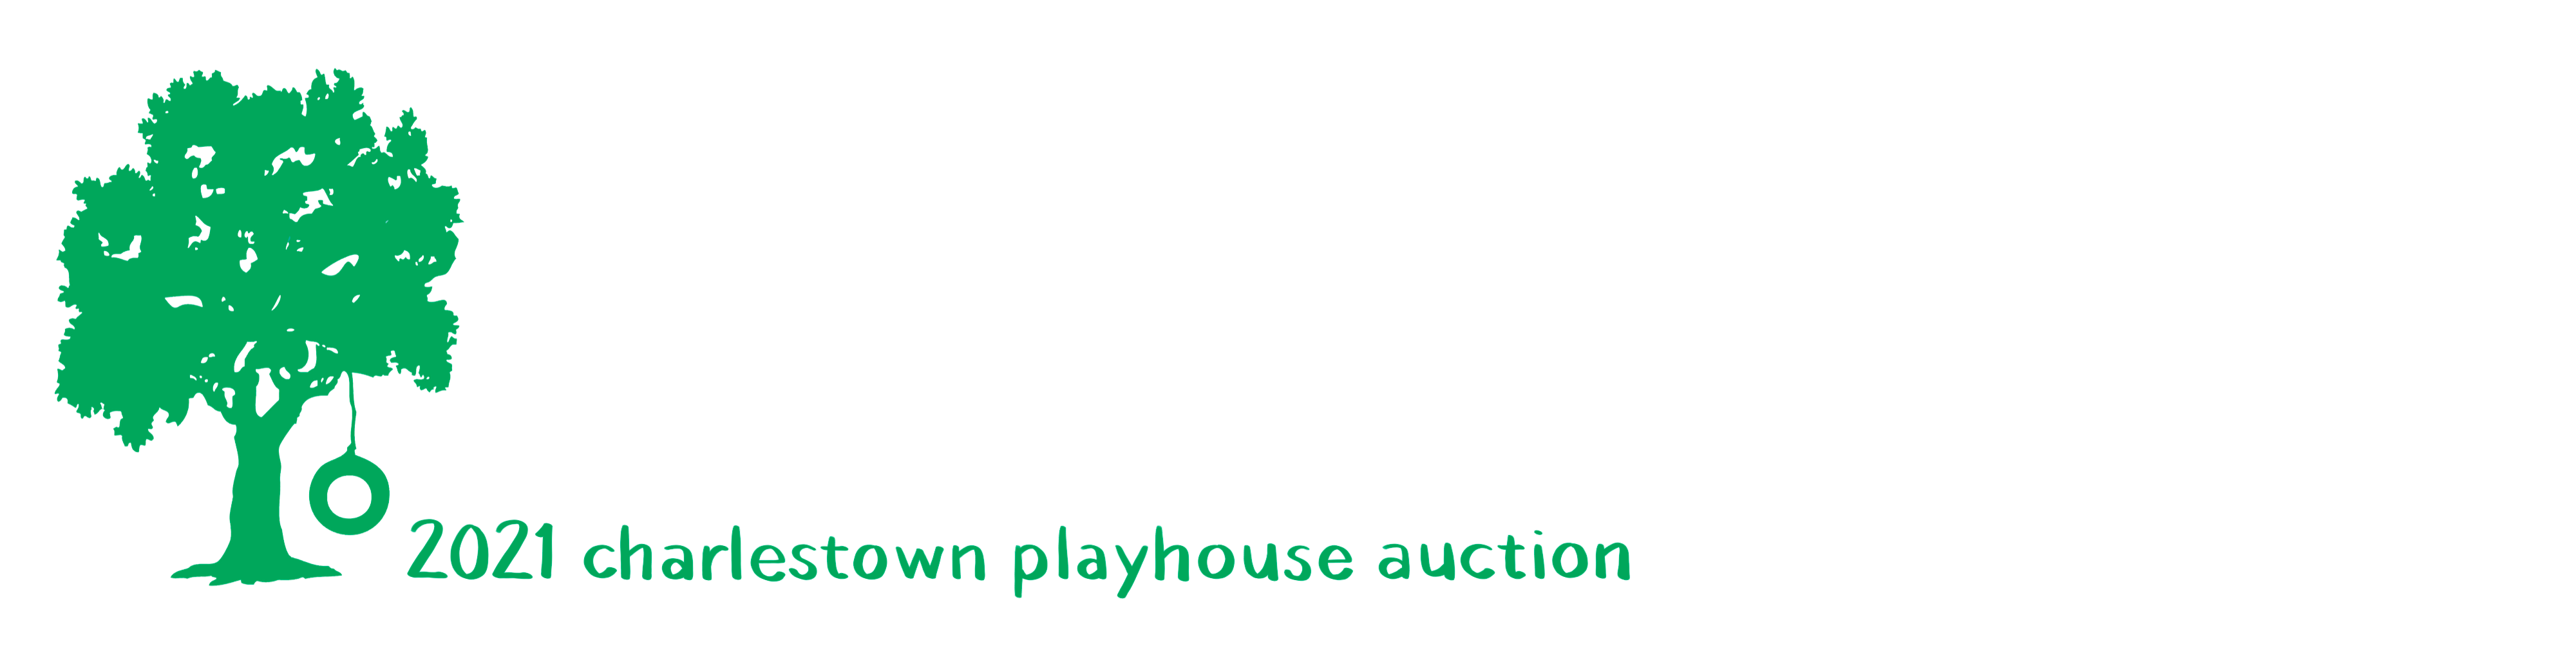 Charlestown Playhouse